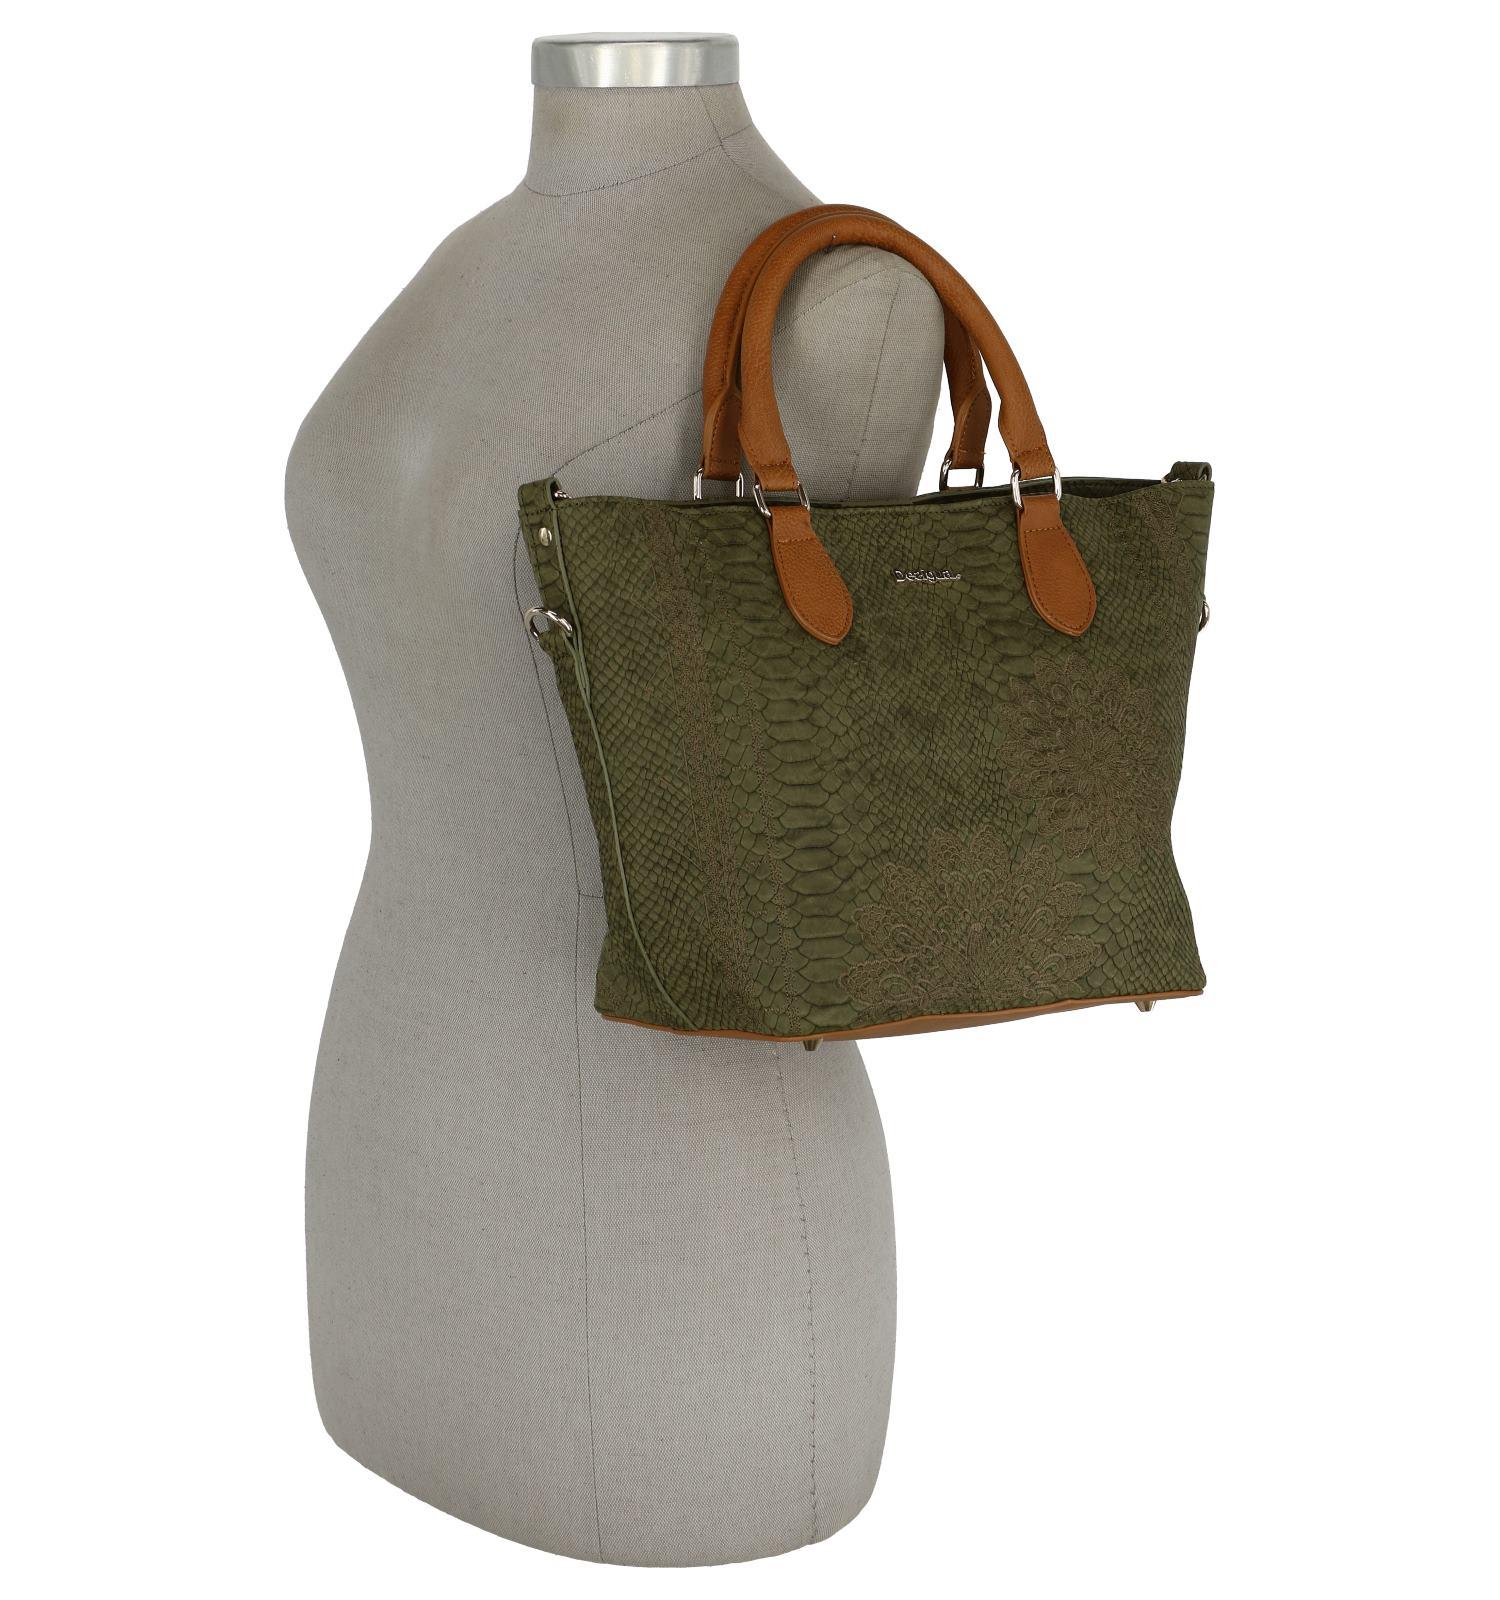 7c293c5dee6 Kaki Bag in Bag Handtas Desigual met Crocoprint   TORFS.BE   Gratis verzend  en retour